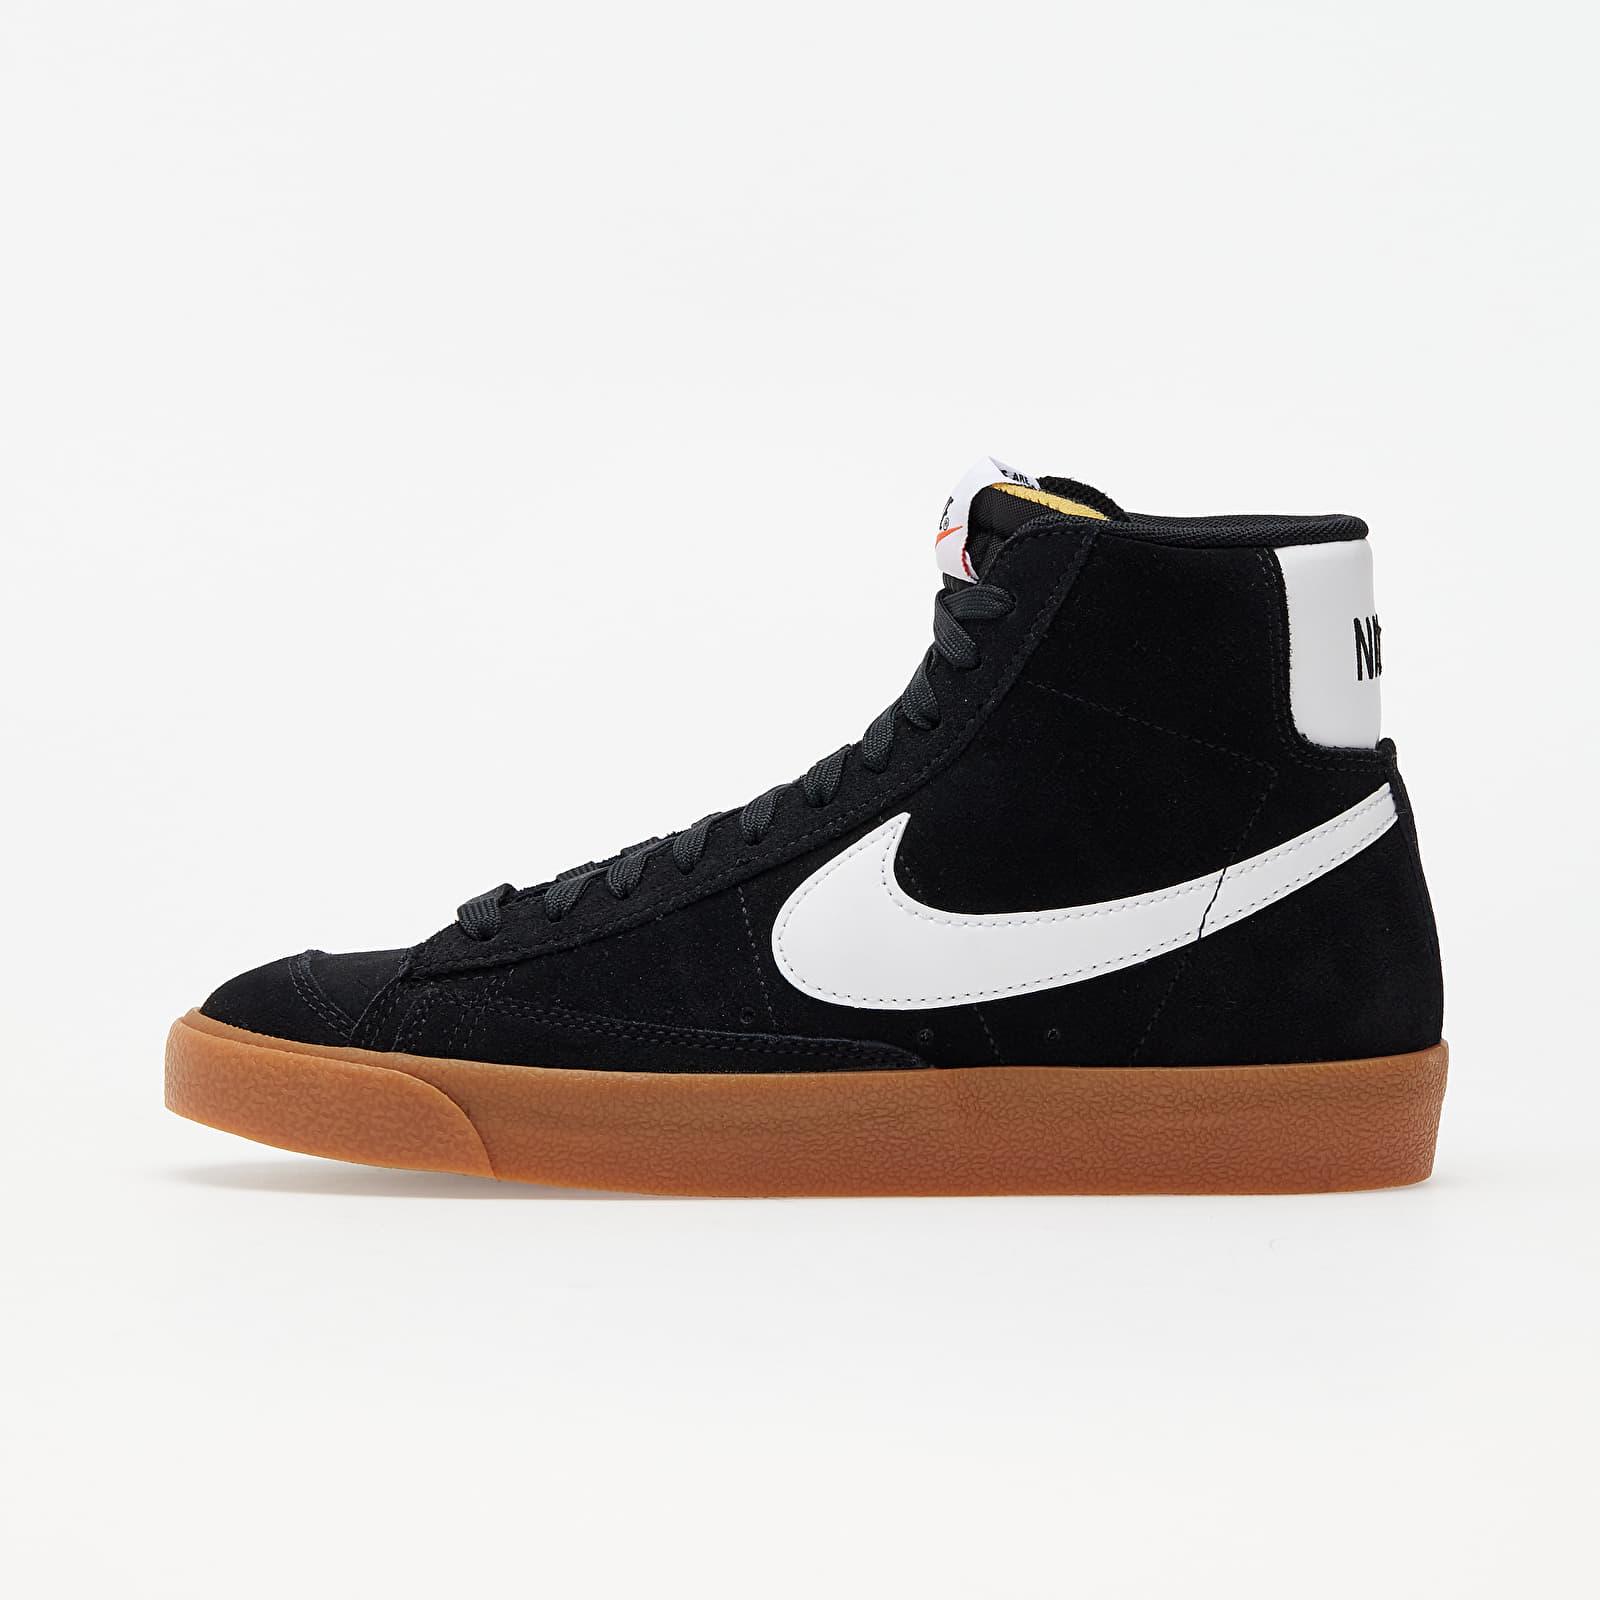 Nike W Blazer Mid '77 Suede Black/ White-Gum Med Brown-Total Orange EUR 40.5